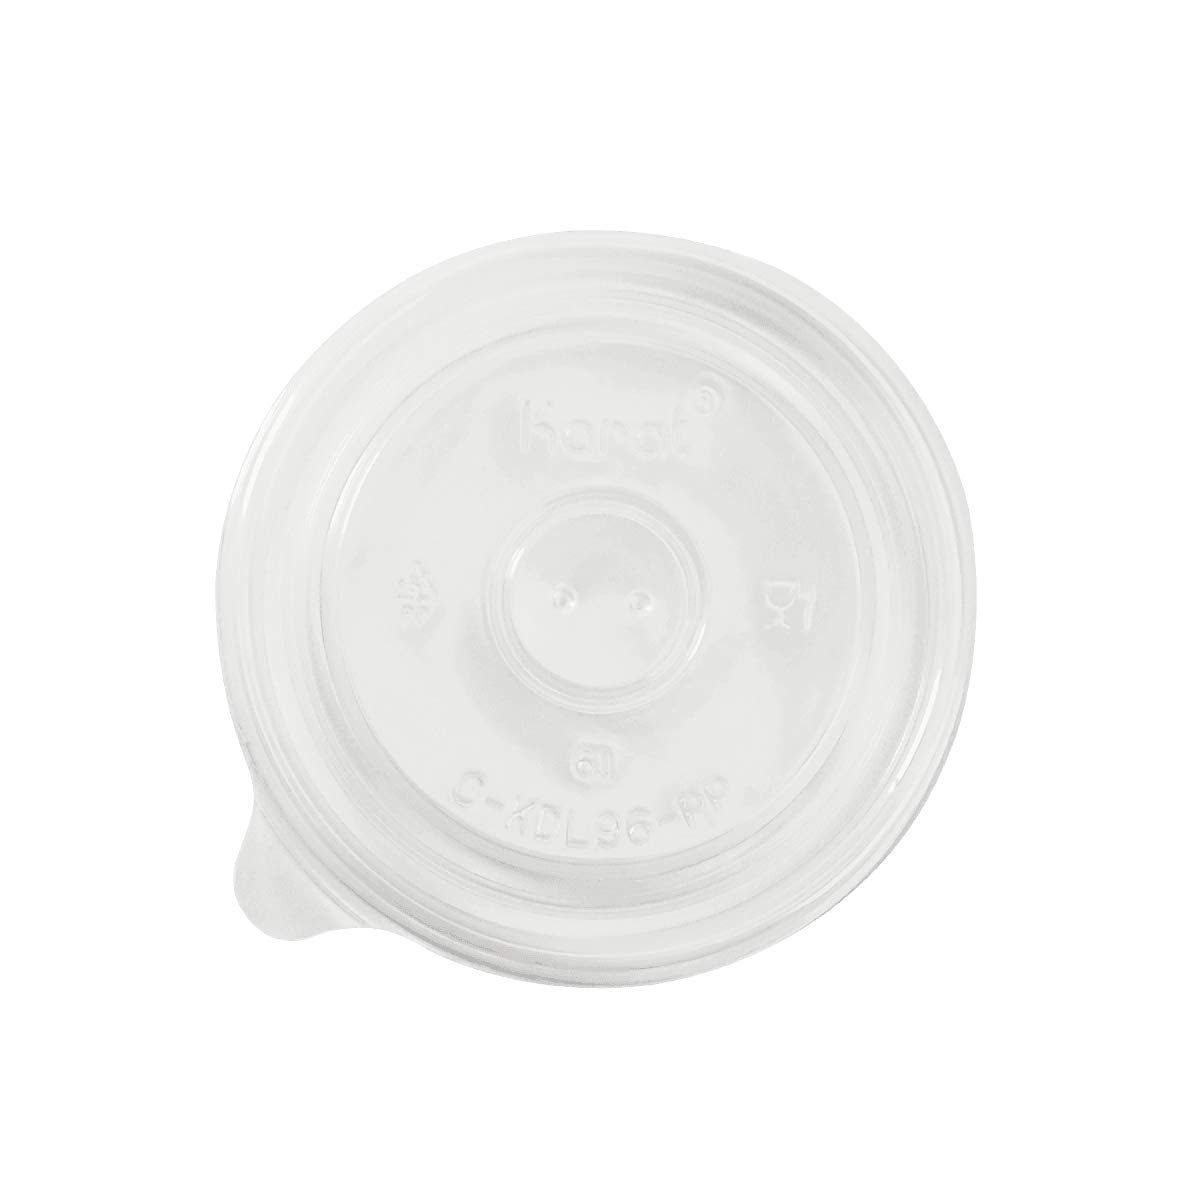 Karat C-KDL96-PP 6 oz PP Food Container Flat Lids (Case of 1000)